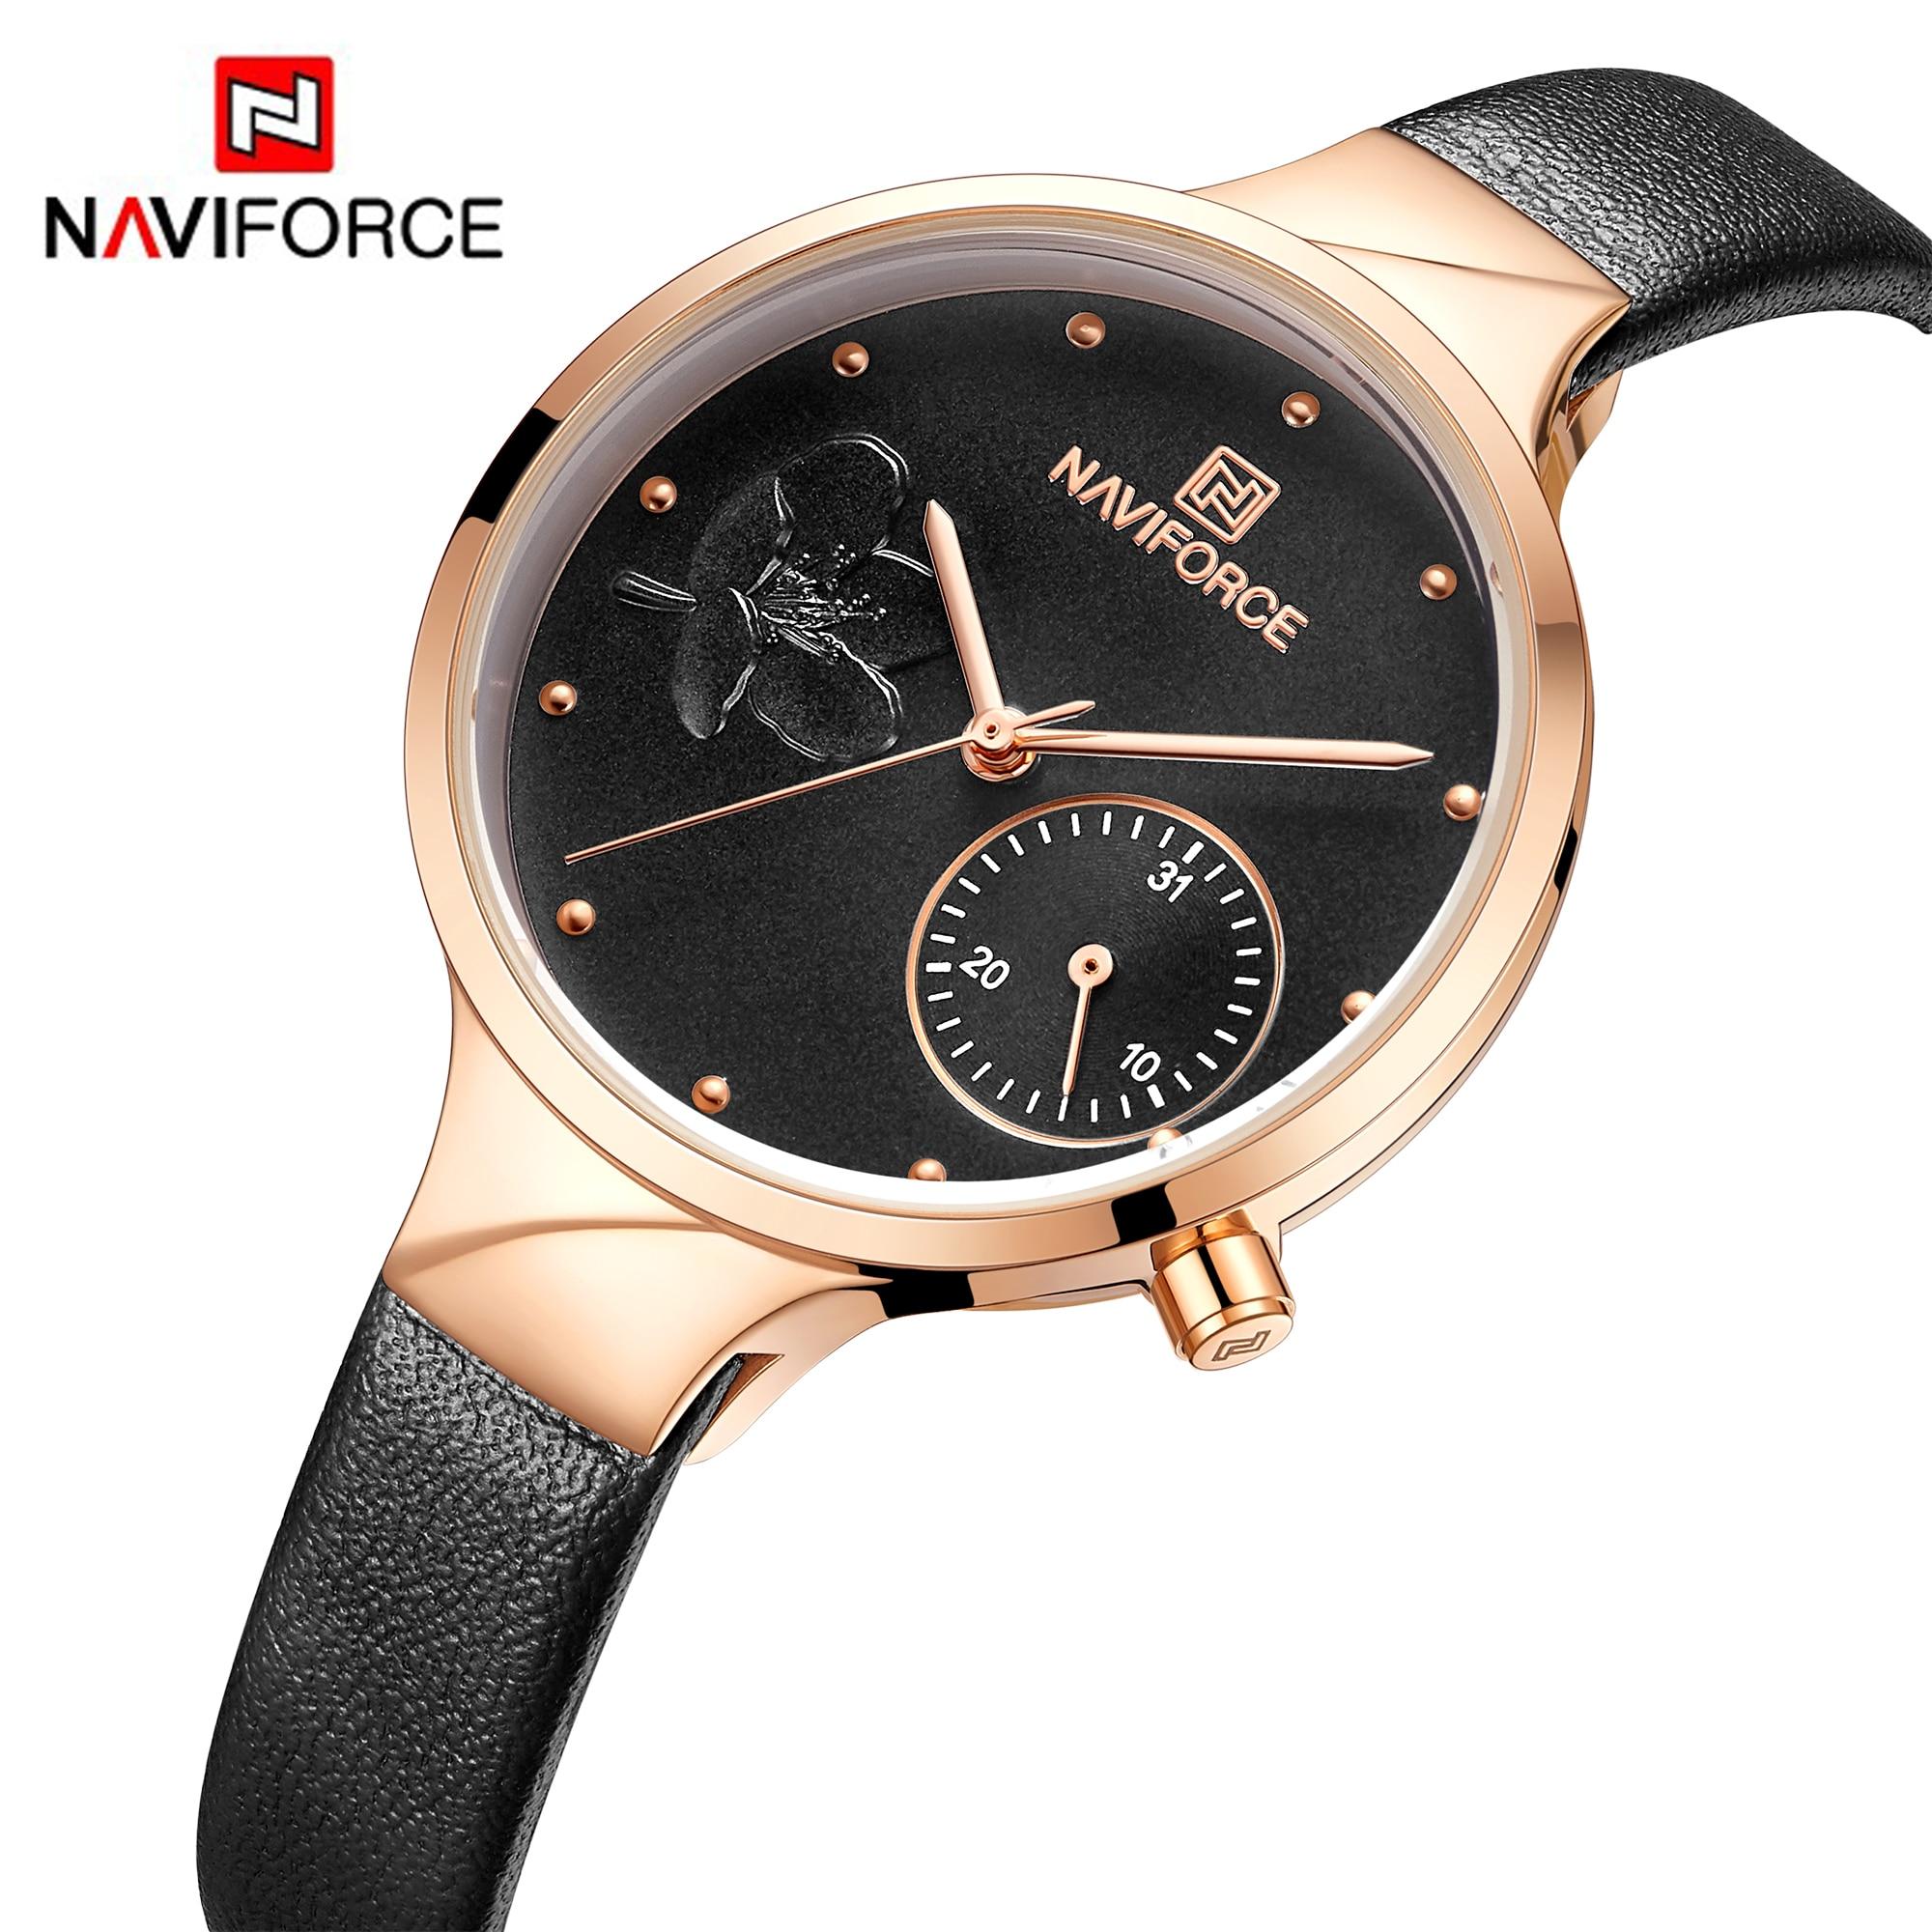 NAVIFORCE Women Watches Luxury Brand Fashion Quartz Ladies Rhinestone Watch Dress Waterproof Watch Simple Clock Relogio FemininoWomens Watches   -